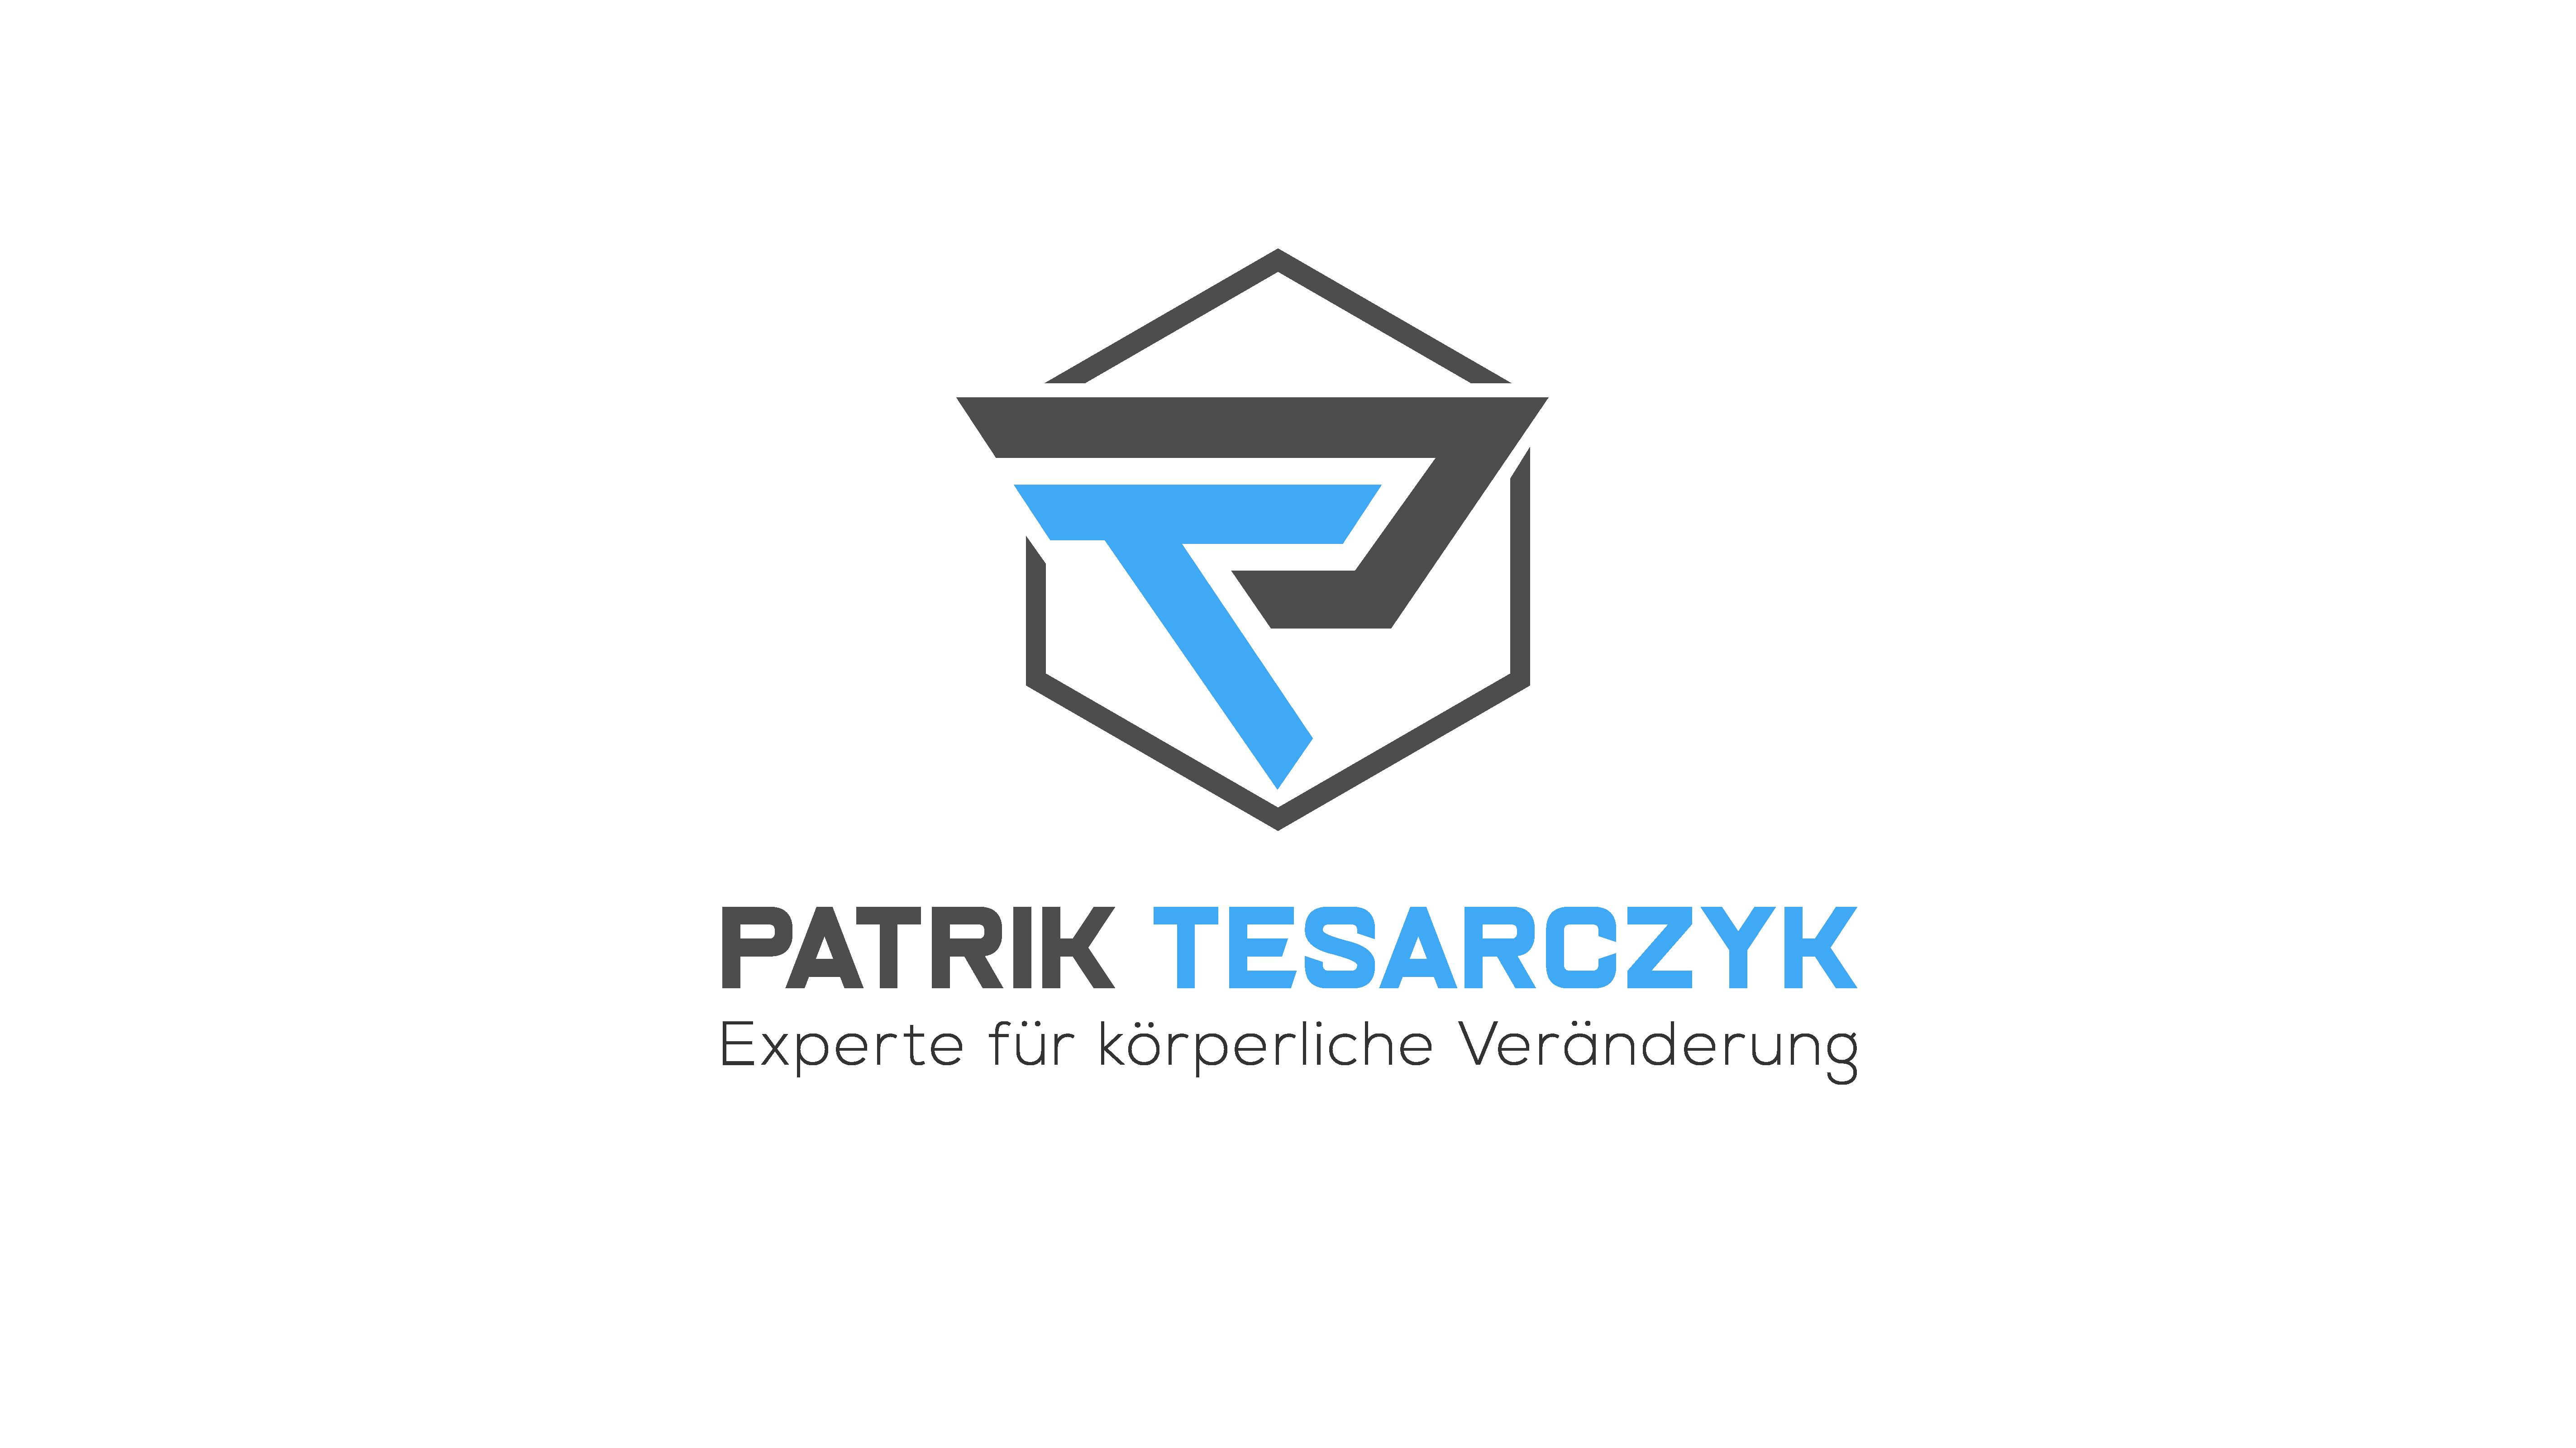 Patrik Tesarczyk